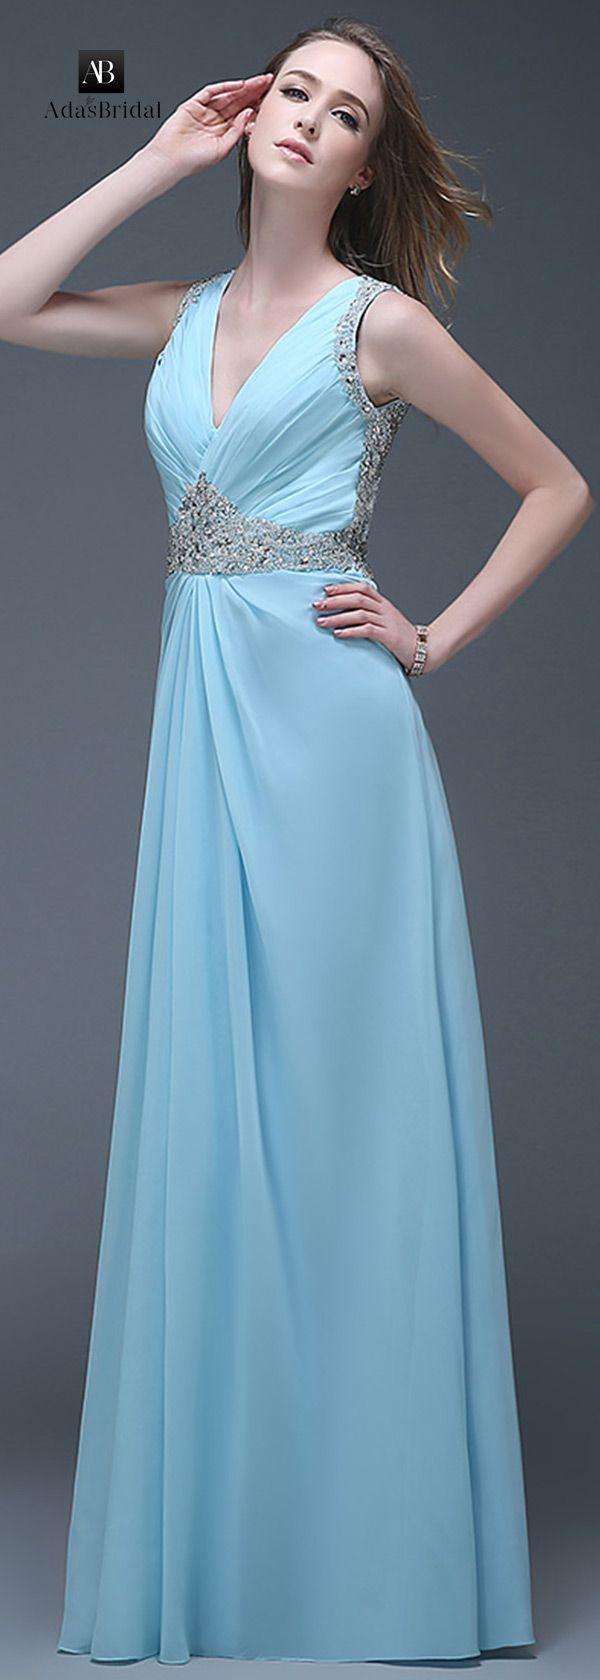 Wonderful chiffon V-neck neckline full-length A-line prom dresses ...